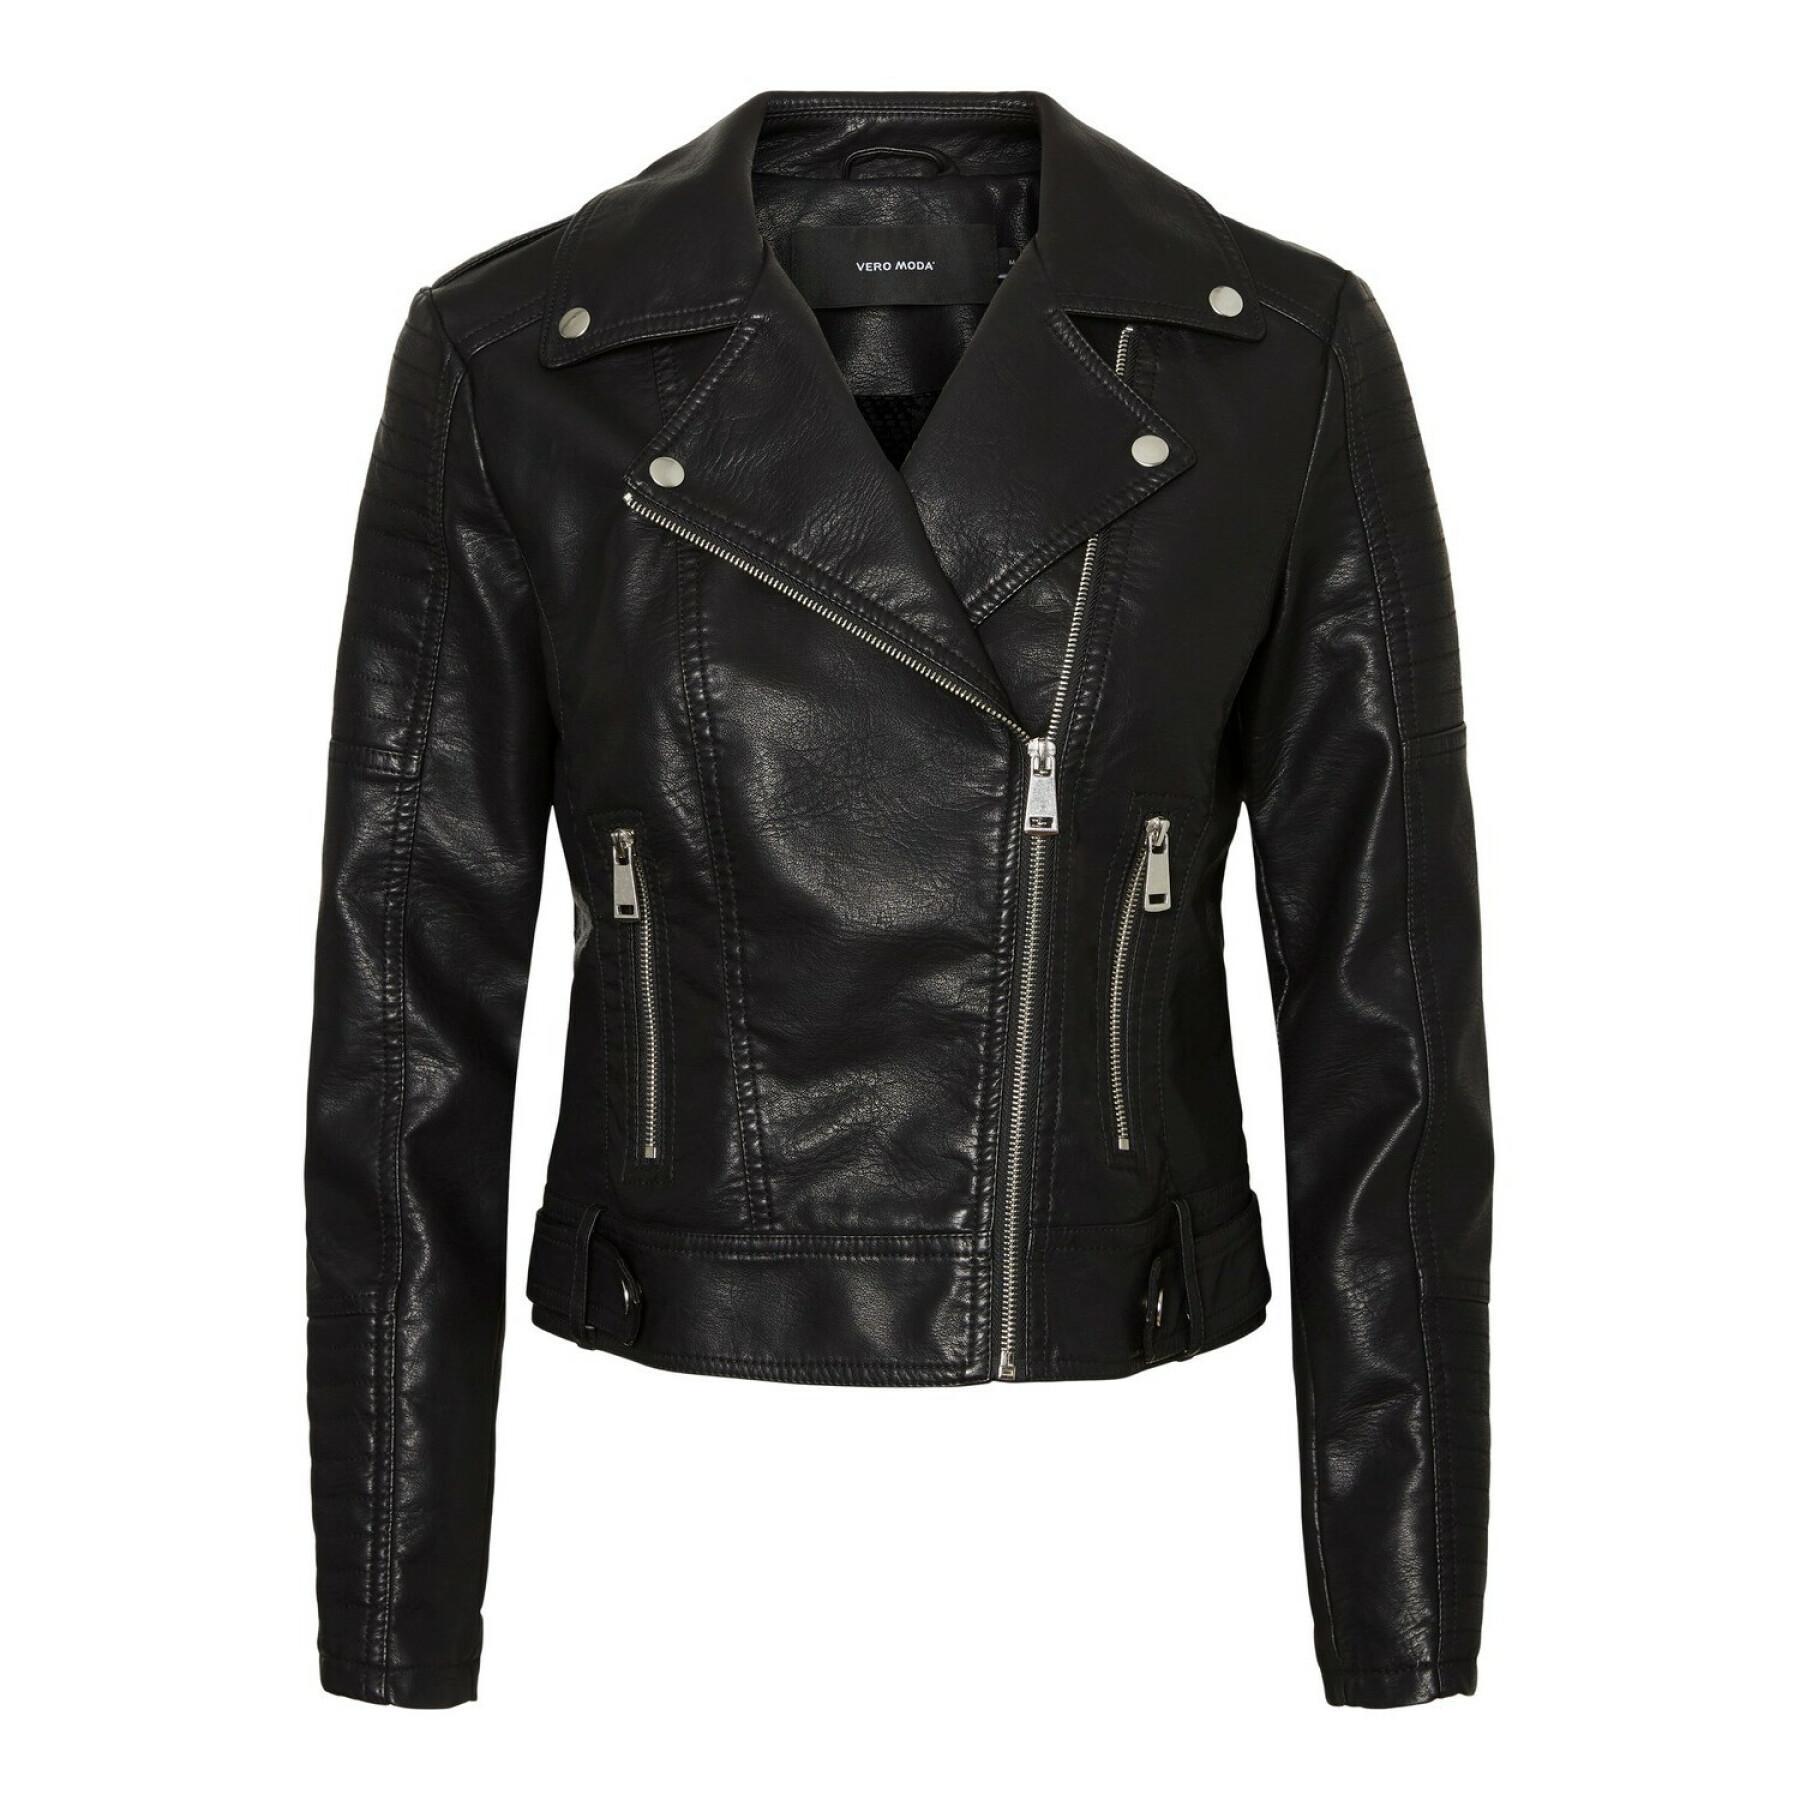 Women's jacket Vero Moda vmkerriultra